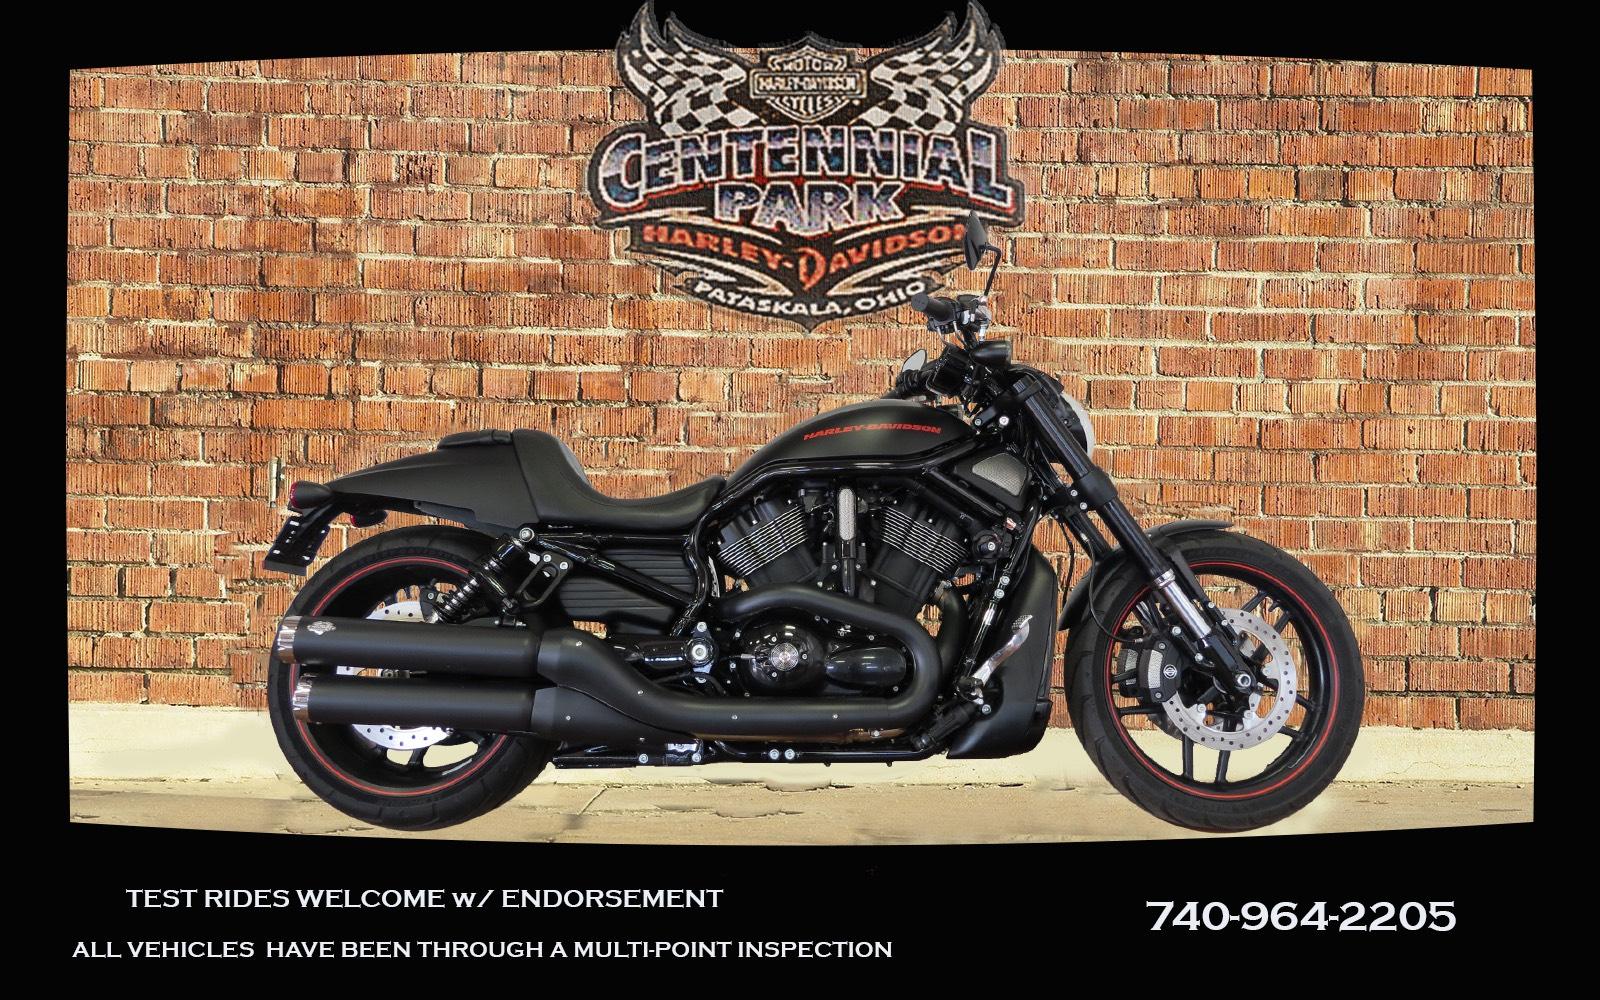 2017 Harley Davidson Night Rod Special In Sunbury Ohio Photo 1